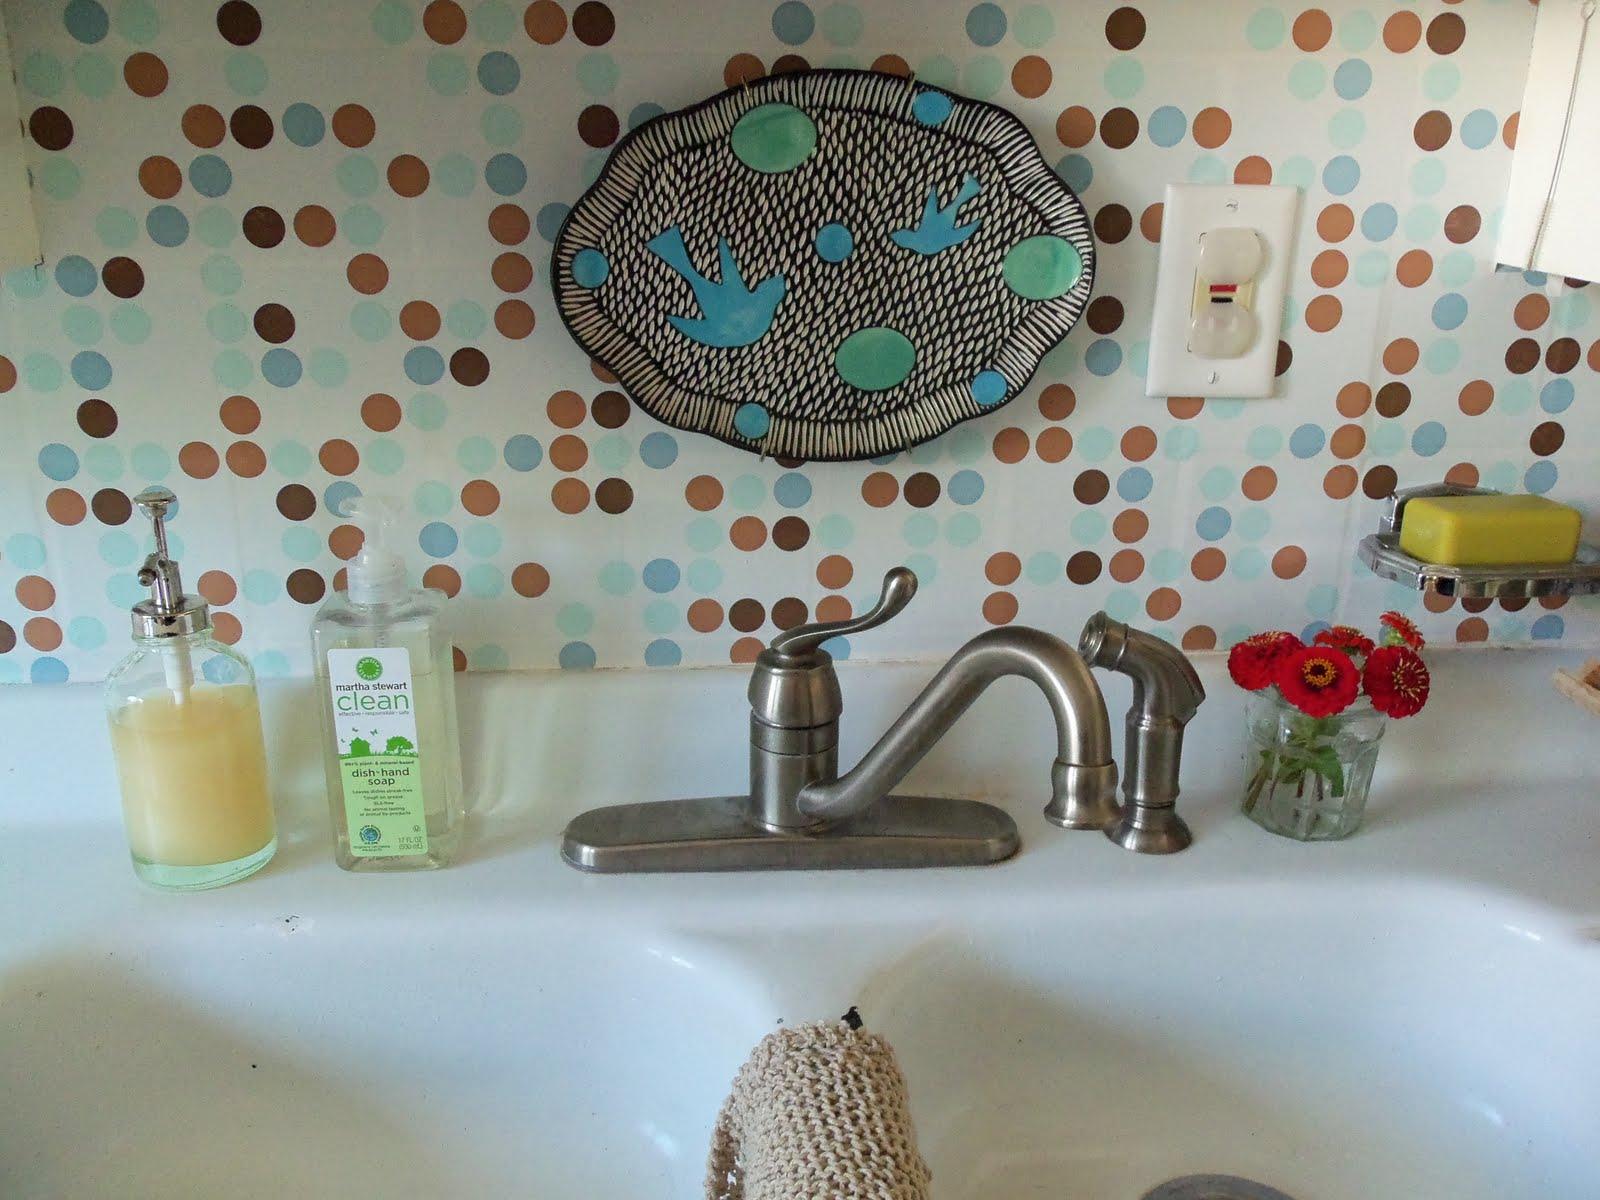 Kitchen Backsplash Contact Paper remodelaholic | quick and painless backsplash makeover